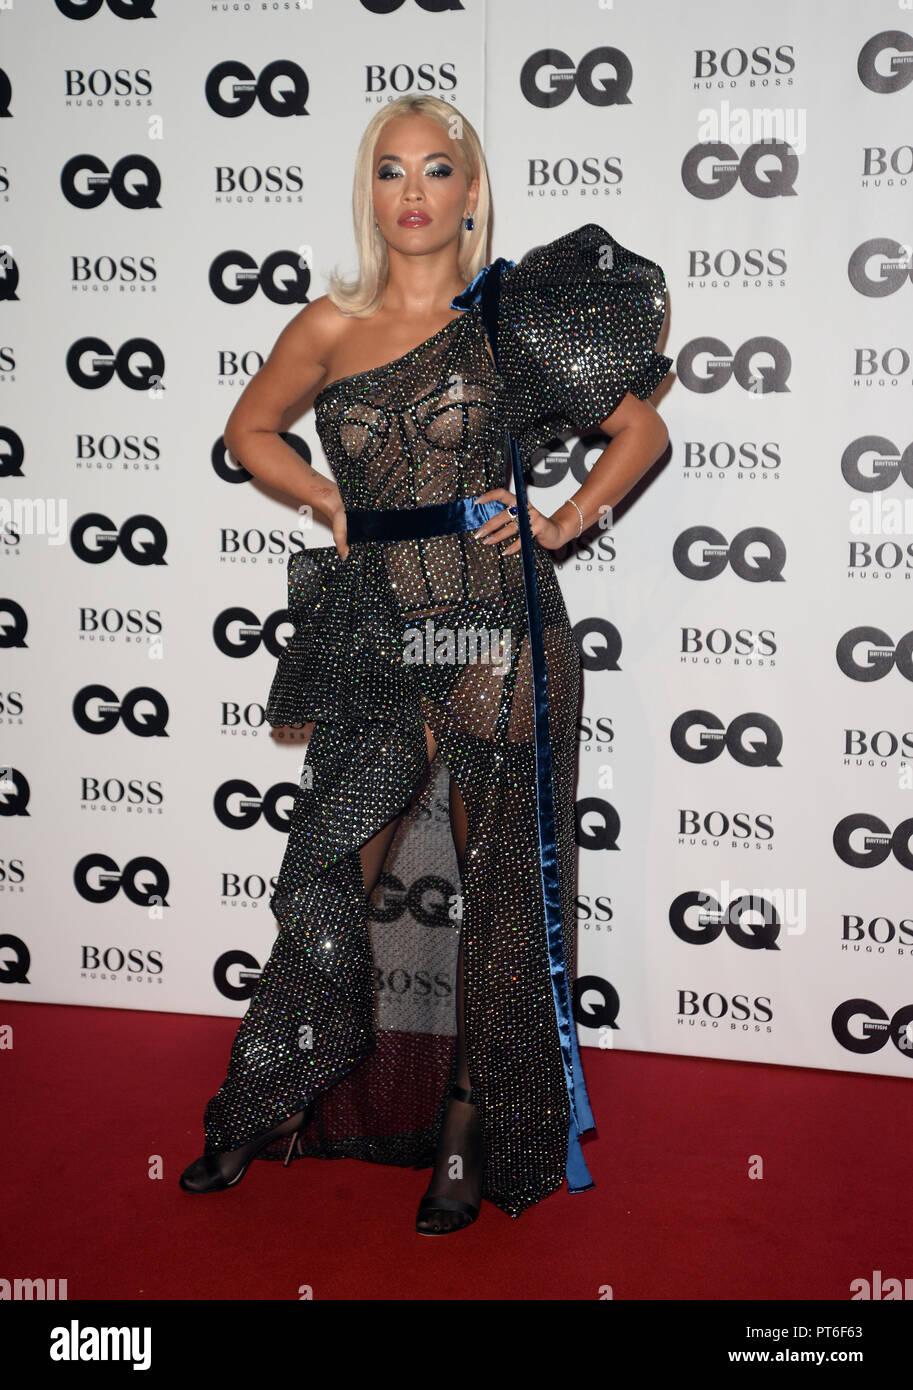 GQ Men Of The Year Awards  Featuring: Rita Ora Where: London, United Kingdom When: 05 Sep 2018 Credit: Tony Oudot/WENN - Stock Image